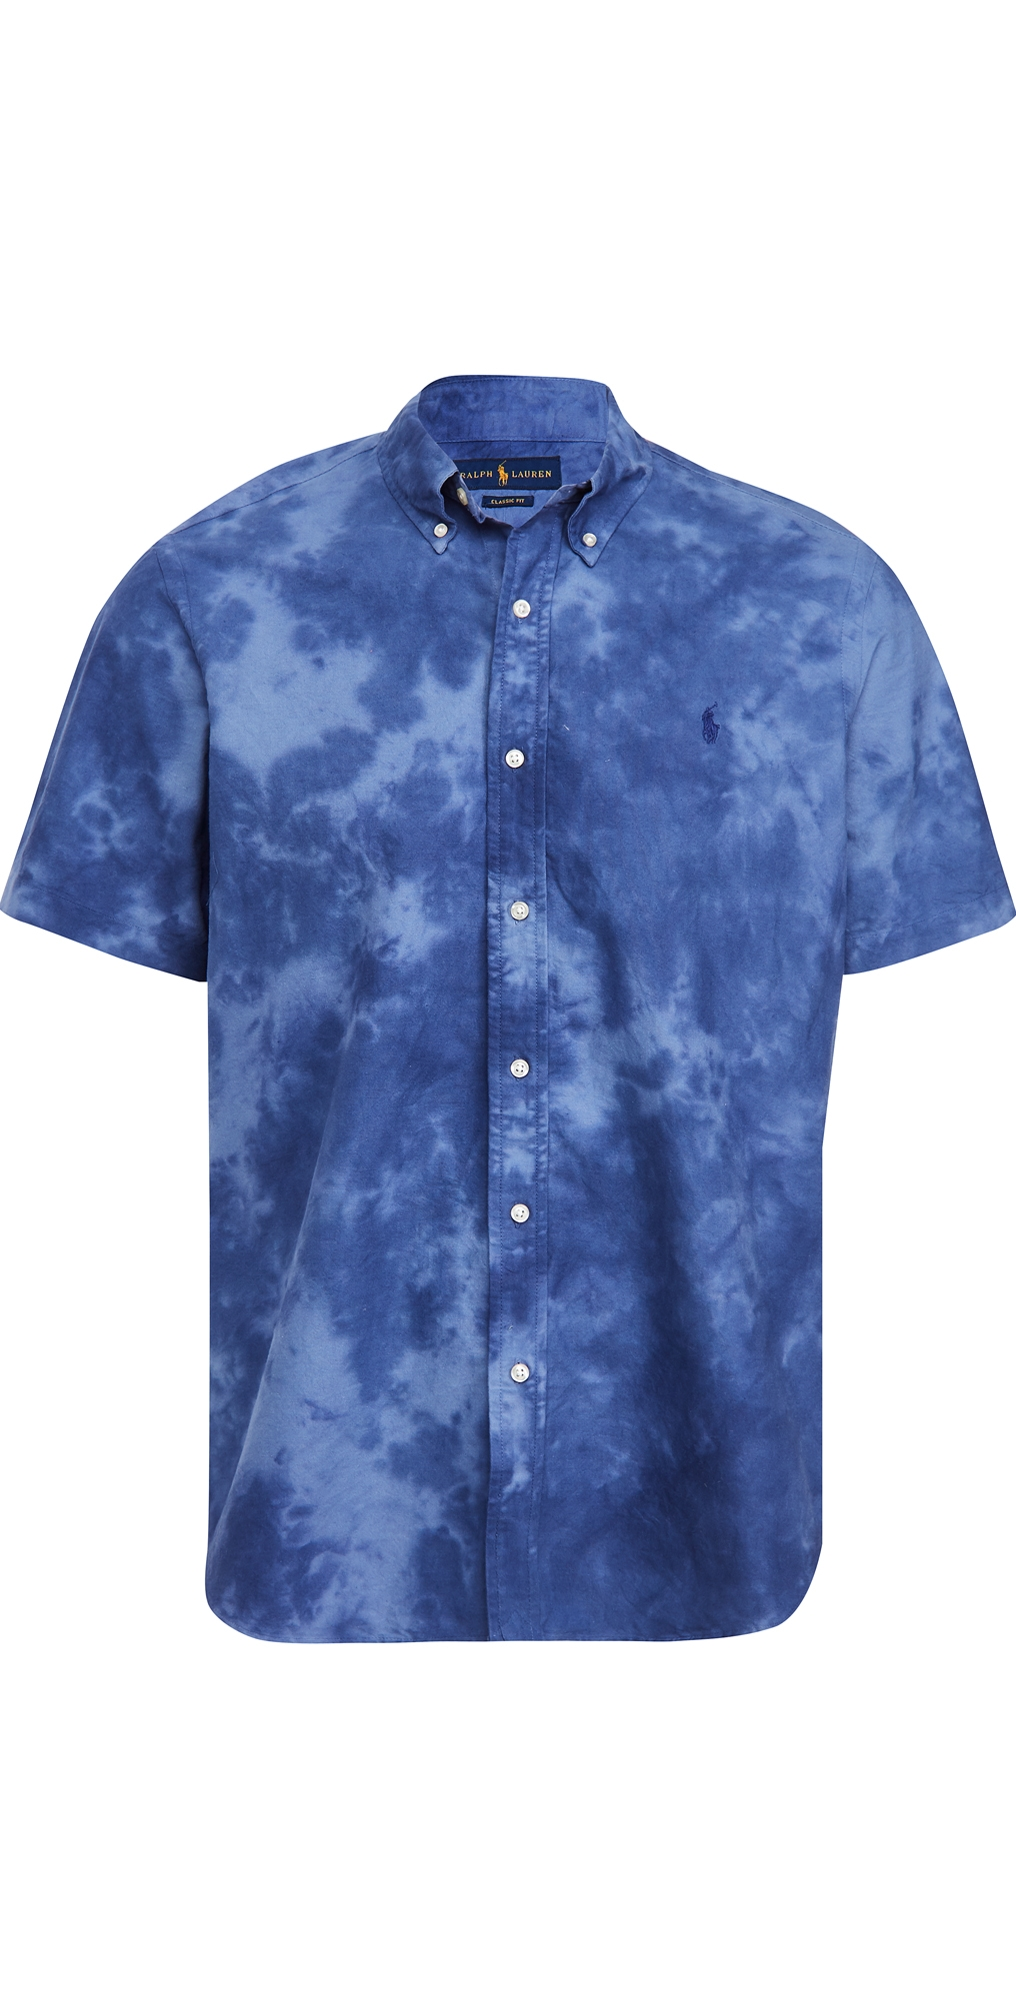 Polo Ralph Lauren Tie Dye Short Sleeve Oxford Shirt